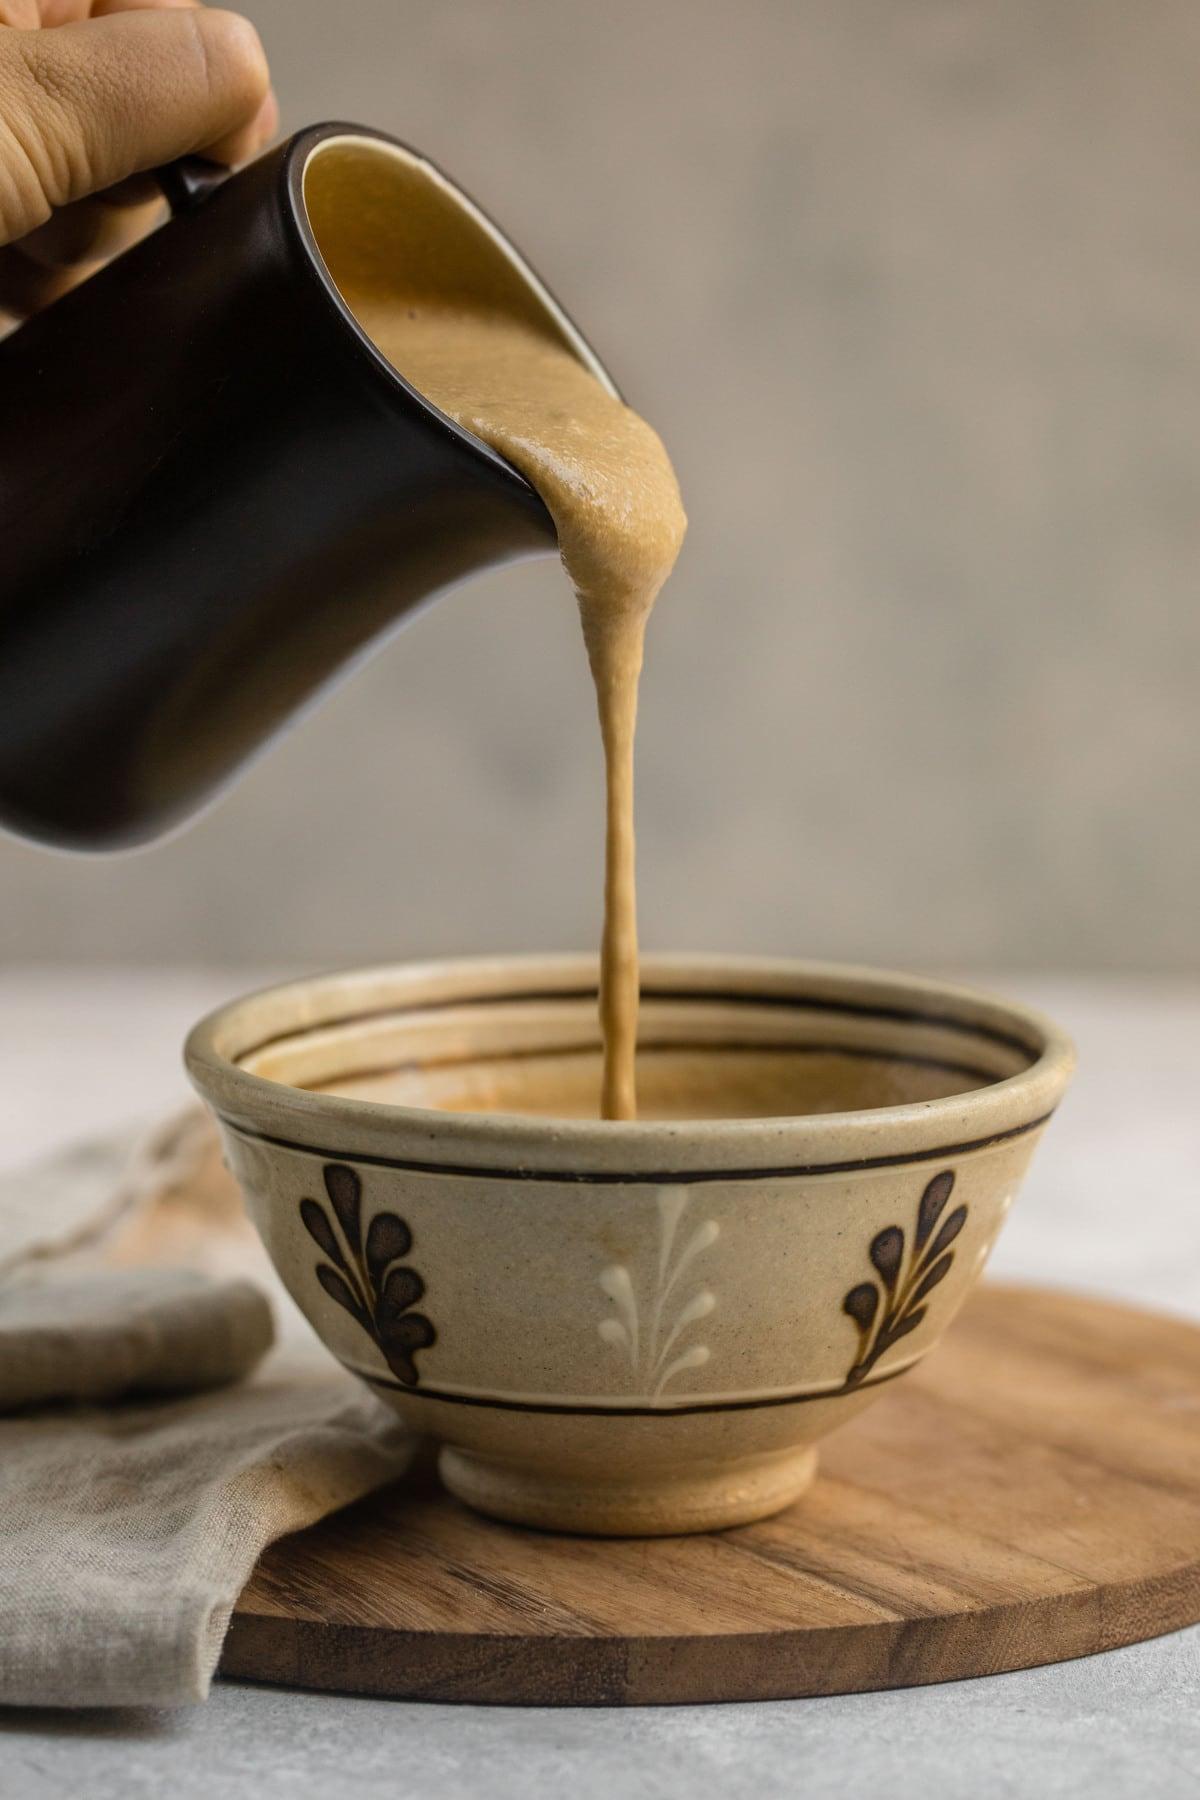 brown gravy pitcher pouring tahini gravy into tan bowl